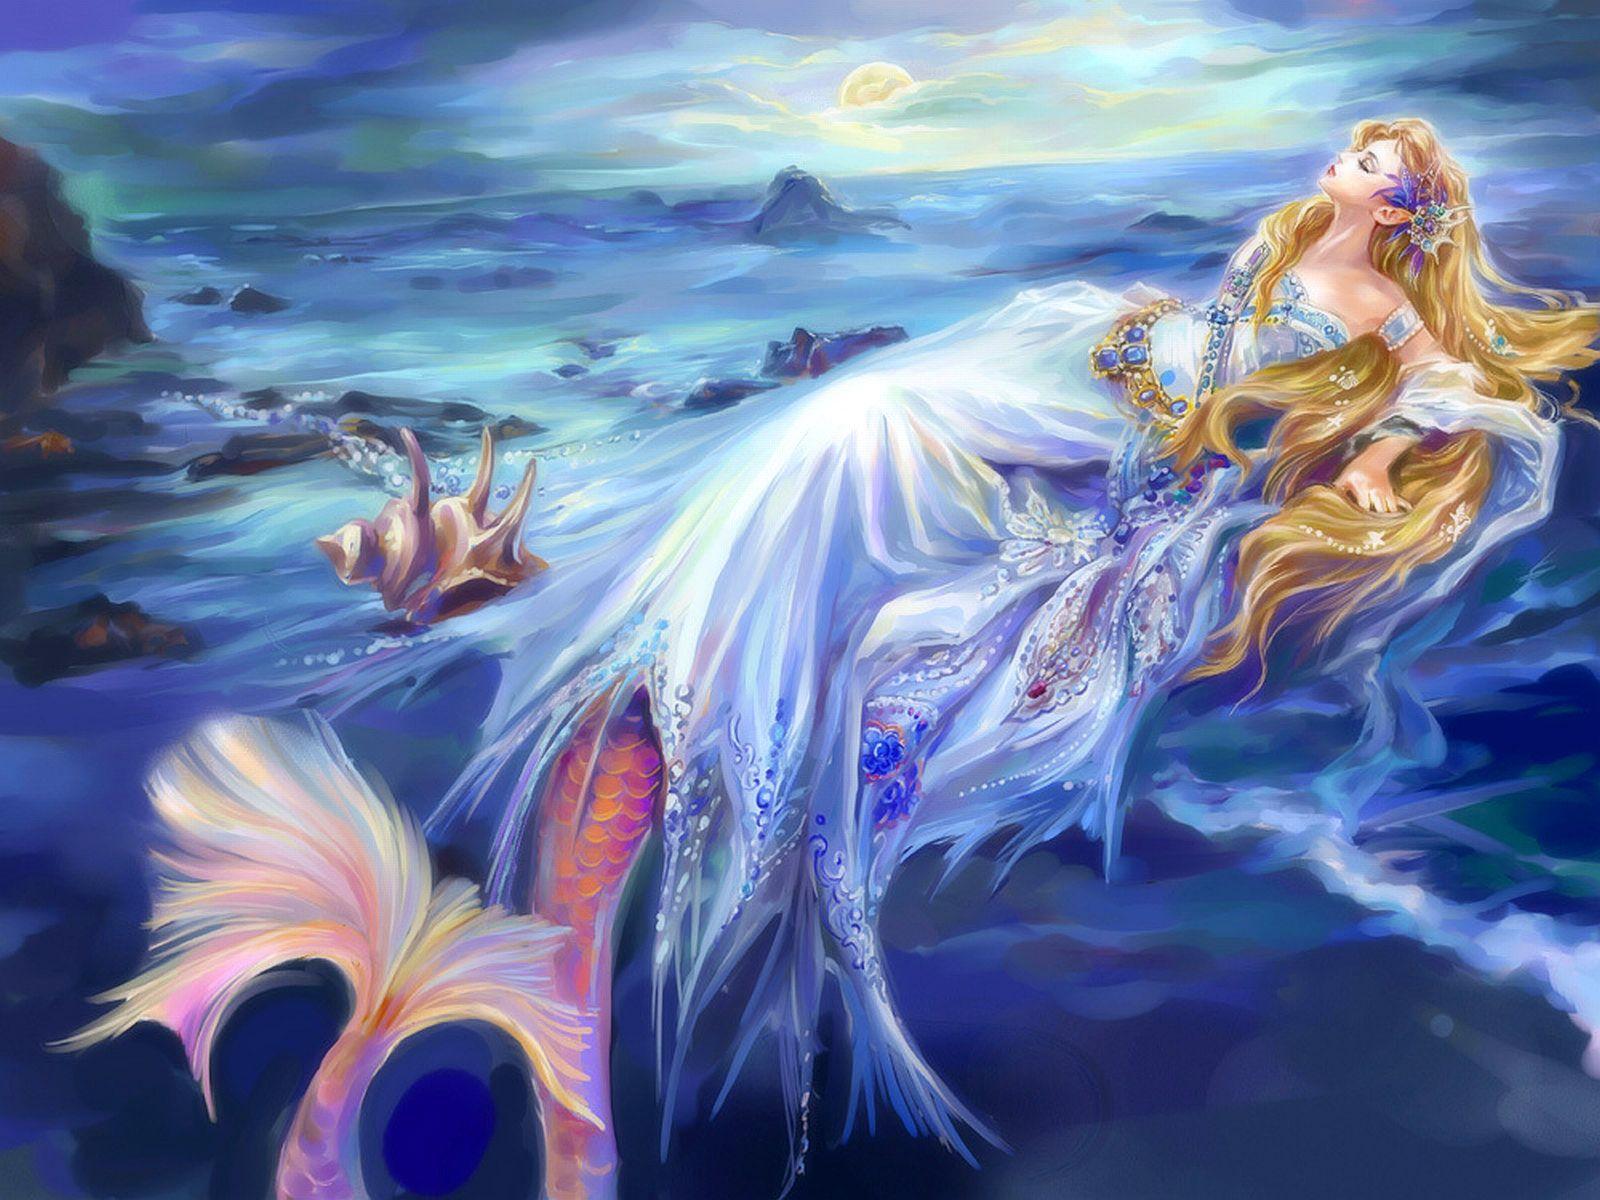 Transforming Mermaid Wallpaper Background 26365 Sirene Fantastique Fond D Ecran Sirene Sirenes Fantastiques